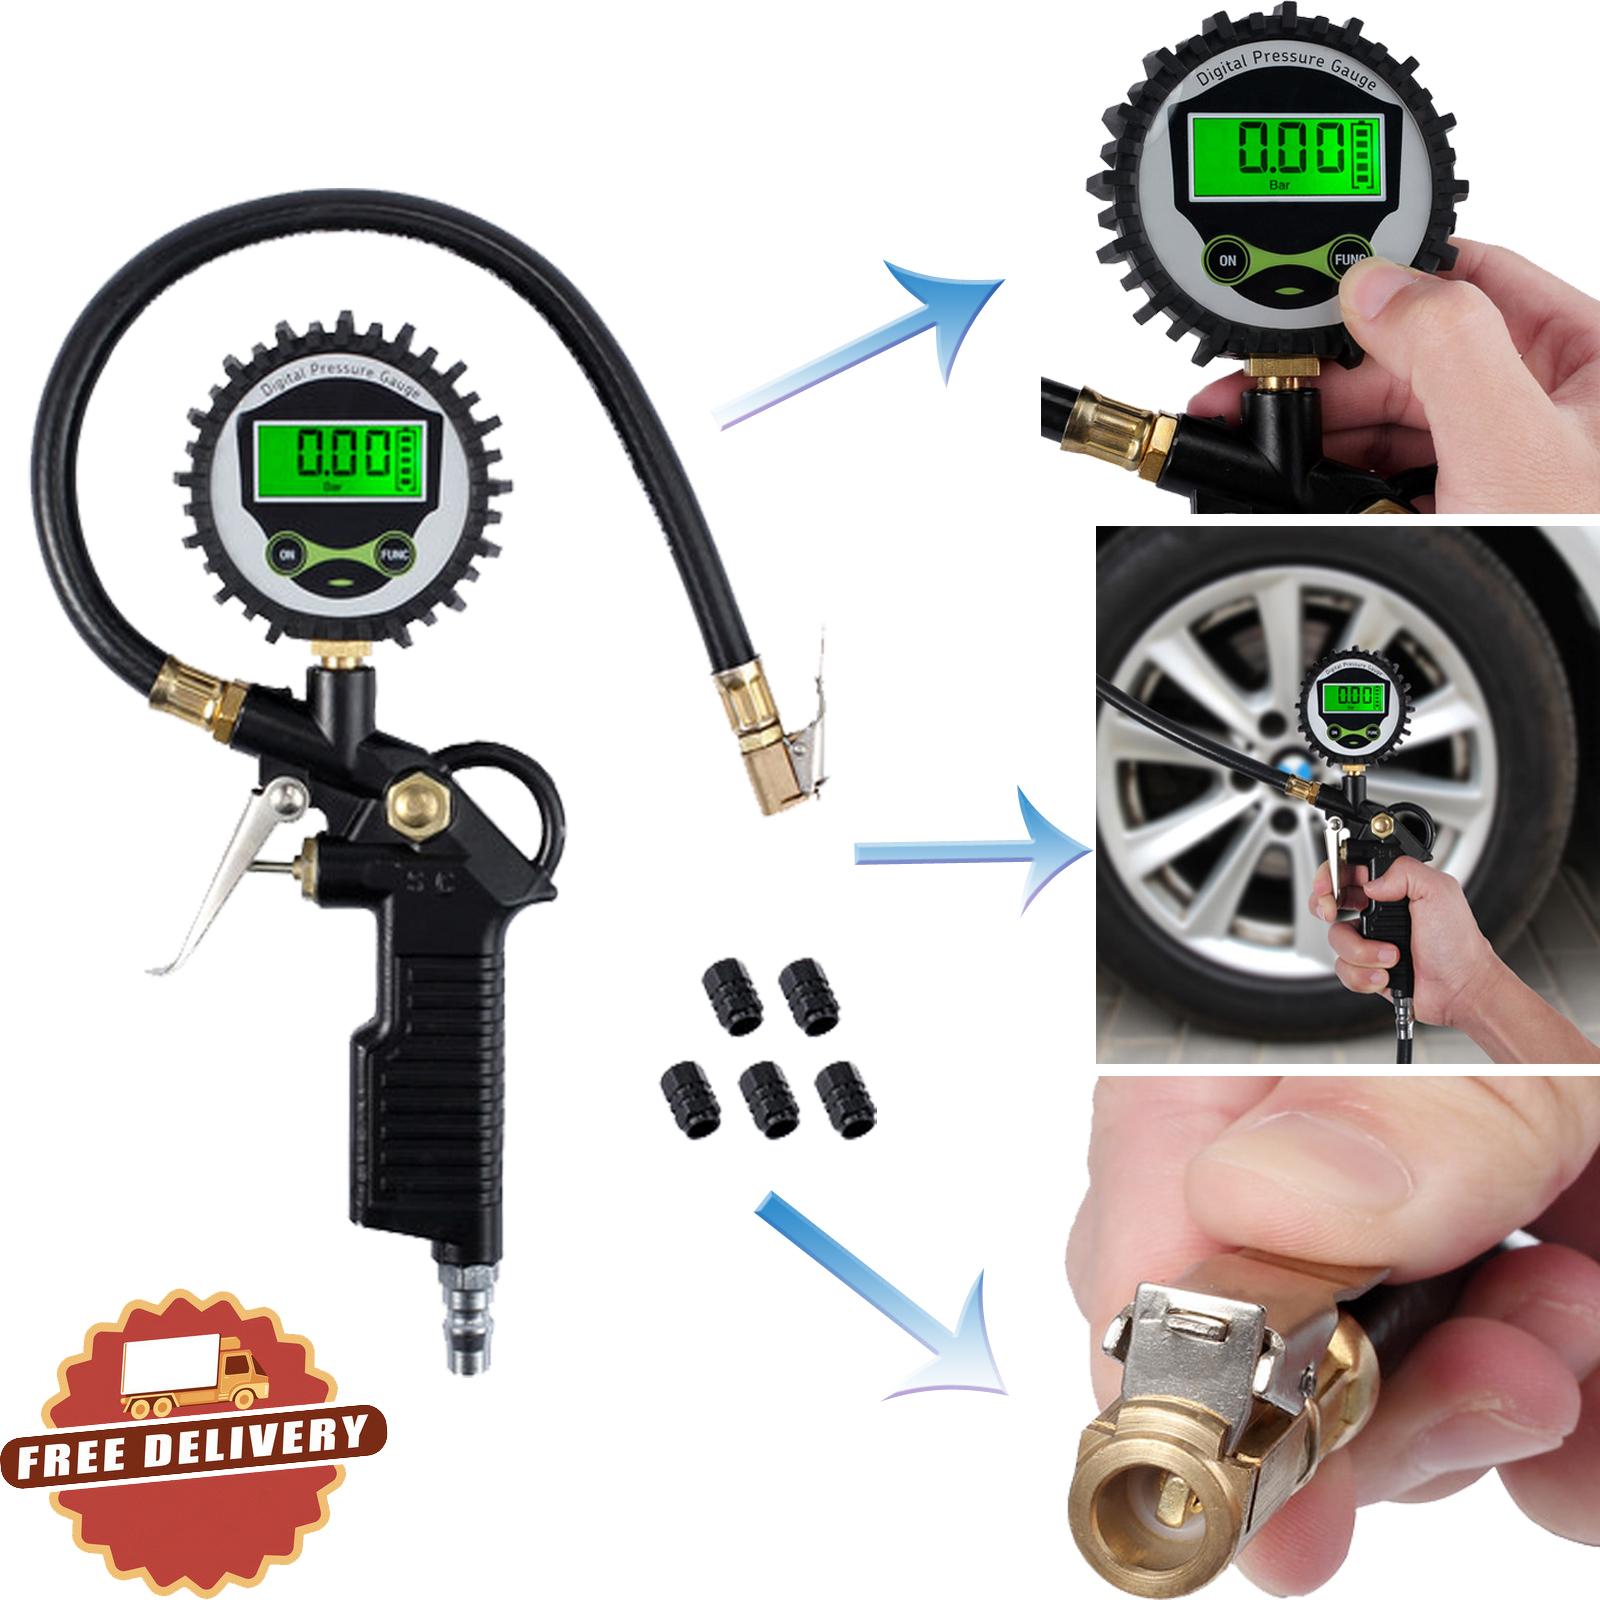 Digital Tire Pressure Gauge Tire Inflator Gauge 200 PSI with 5 Black Valve Caps